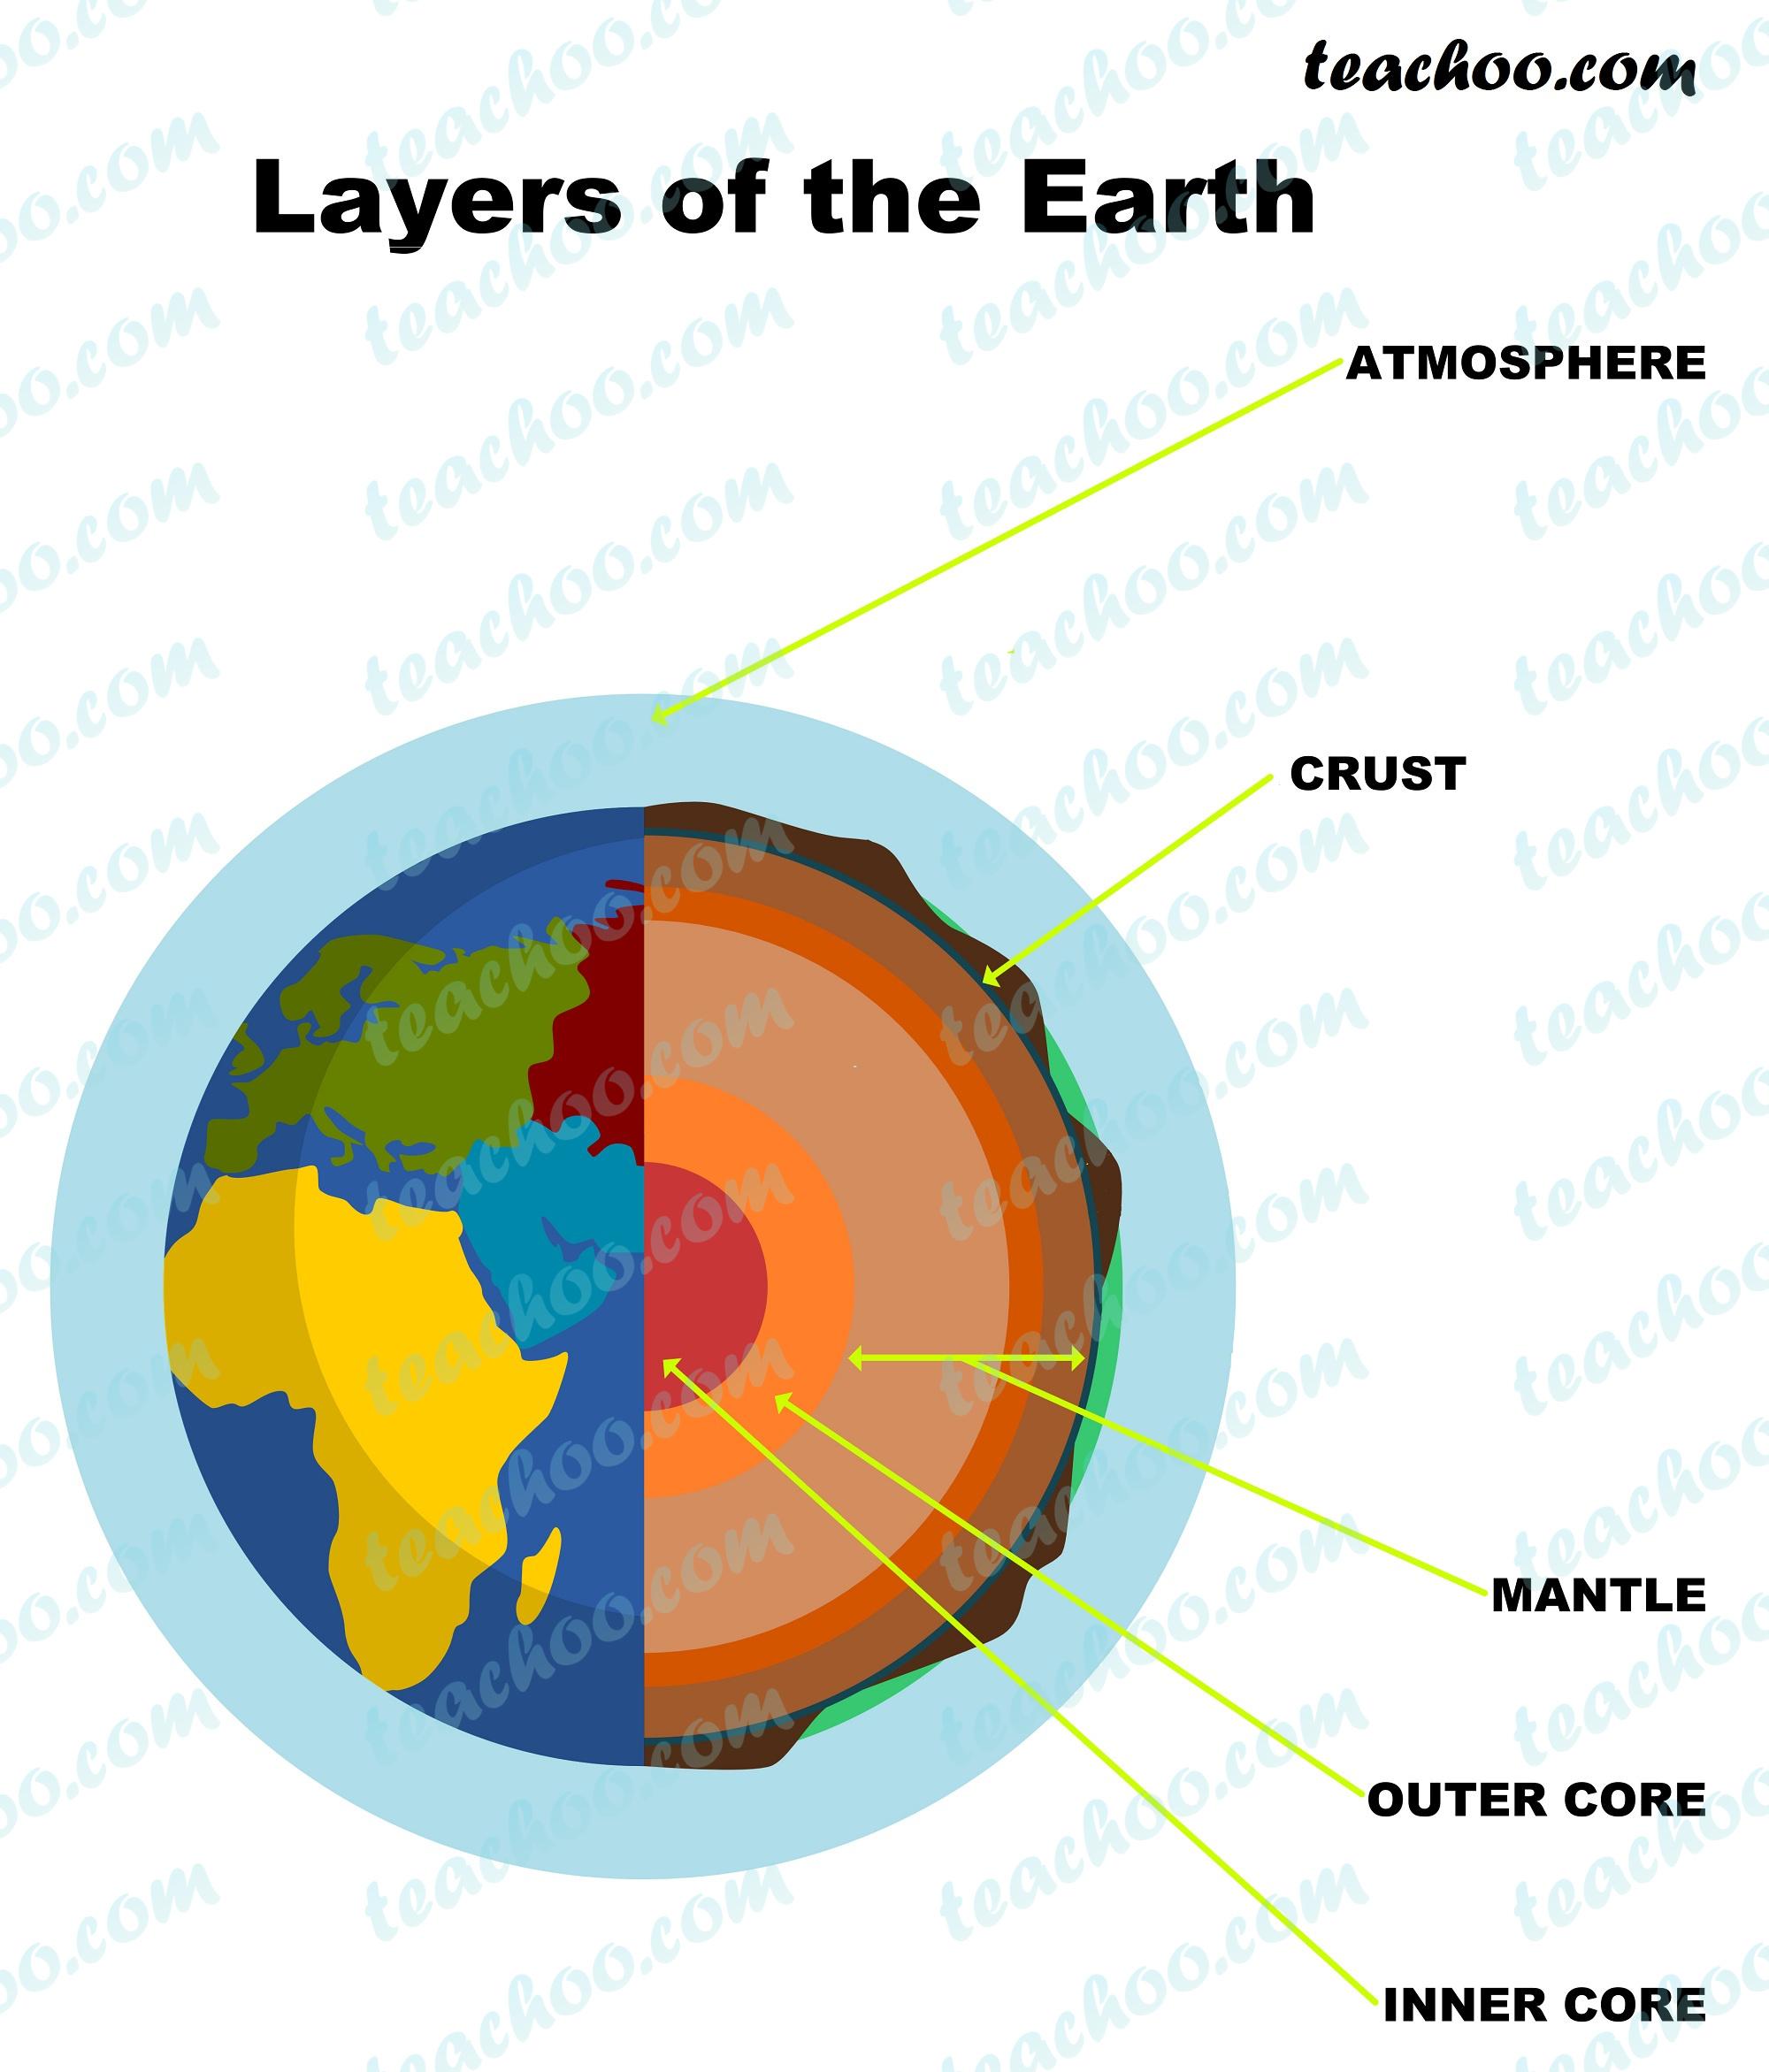 layers-of-earth---teachoo.jpeg